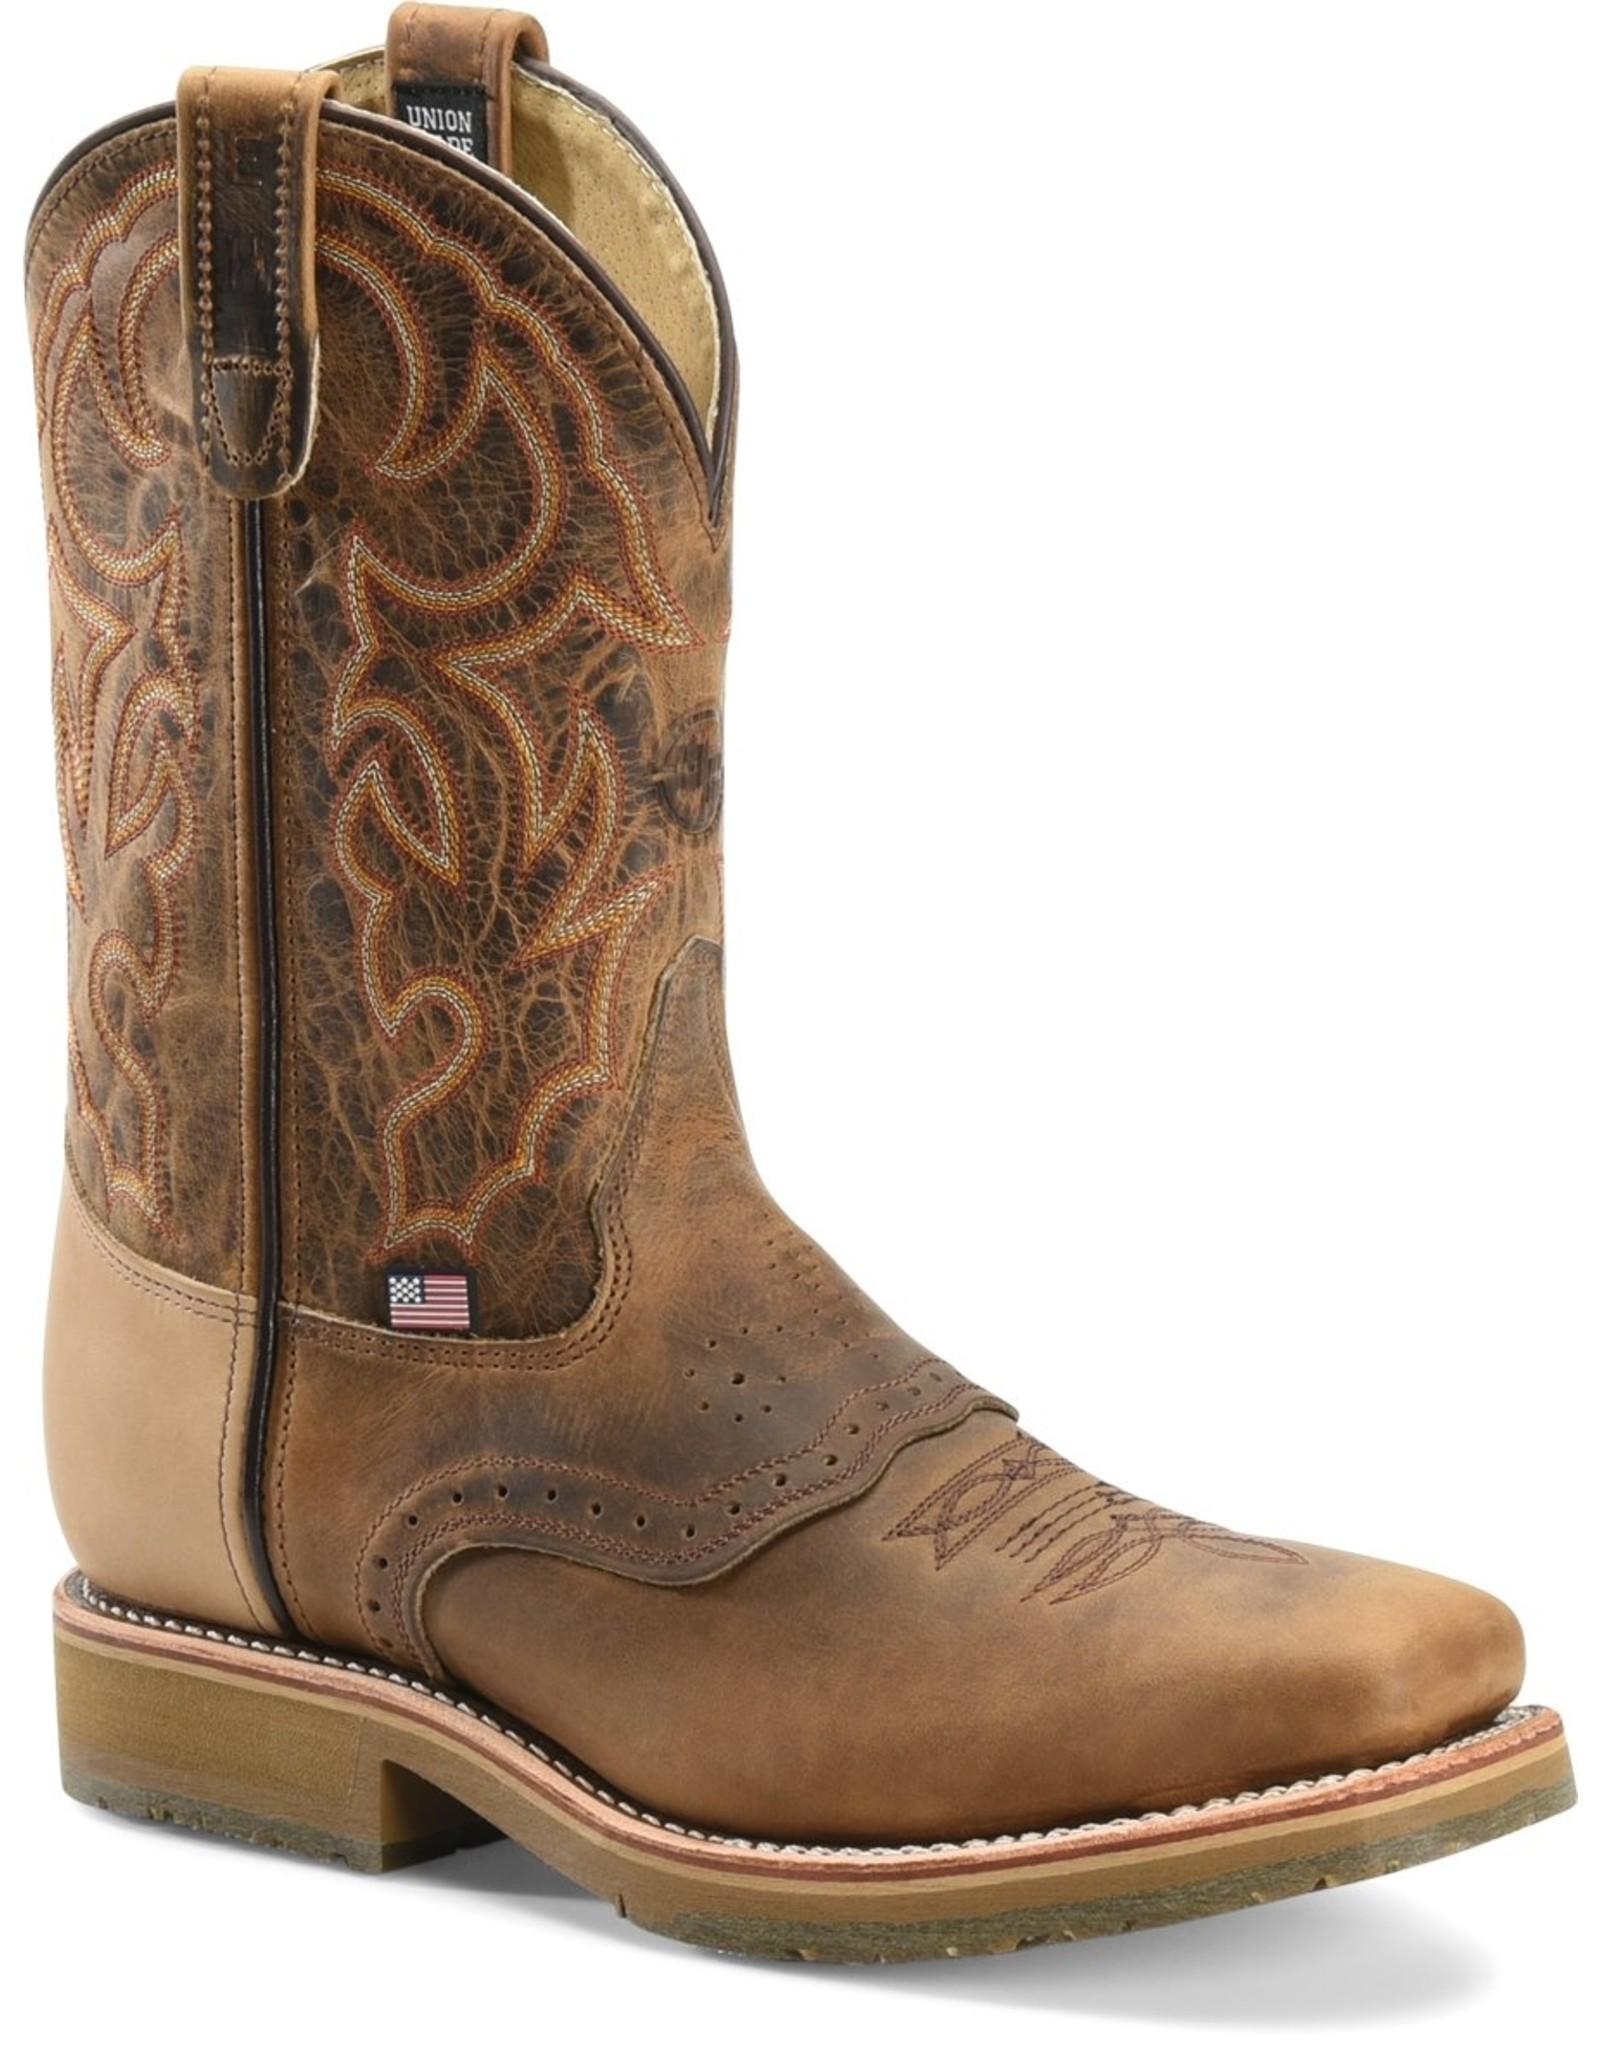 Boots-Men Double H DH3567 Dwight Steel Toe